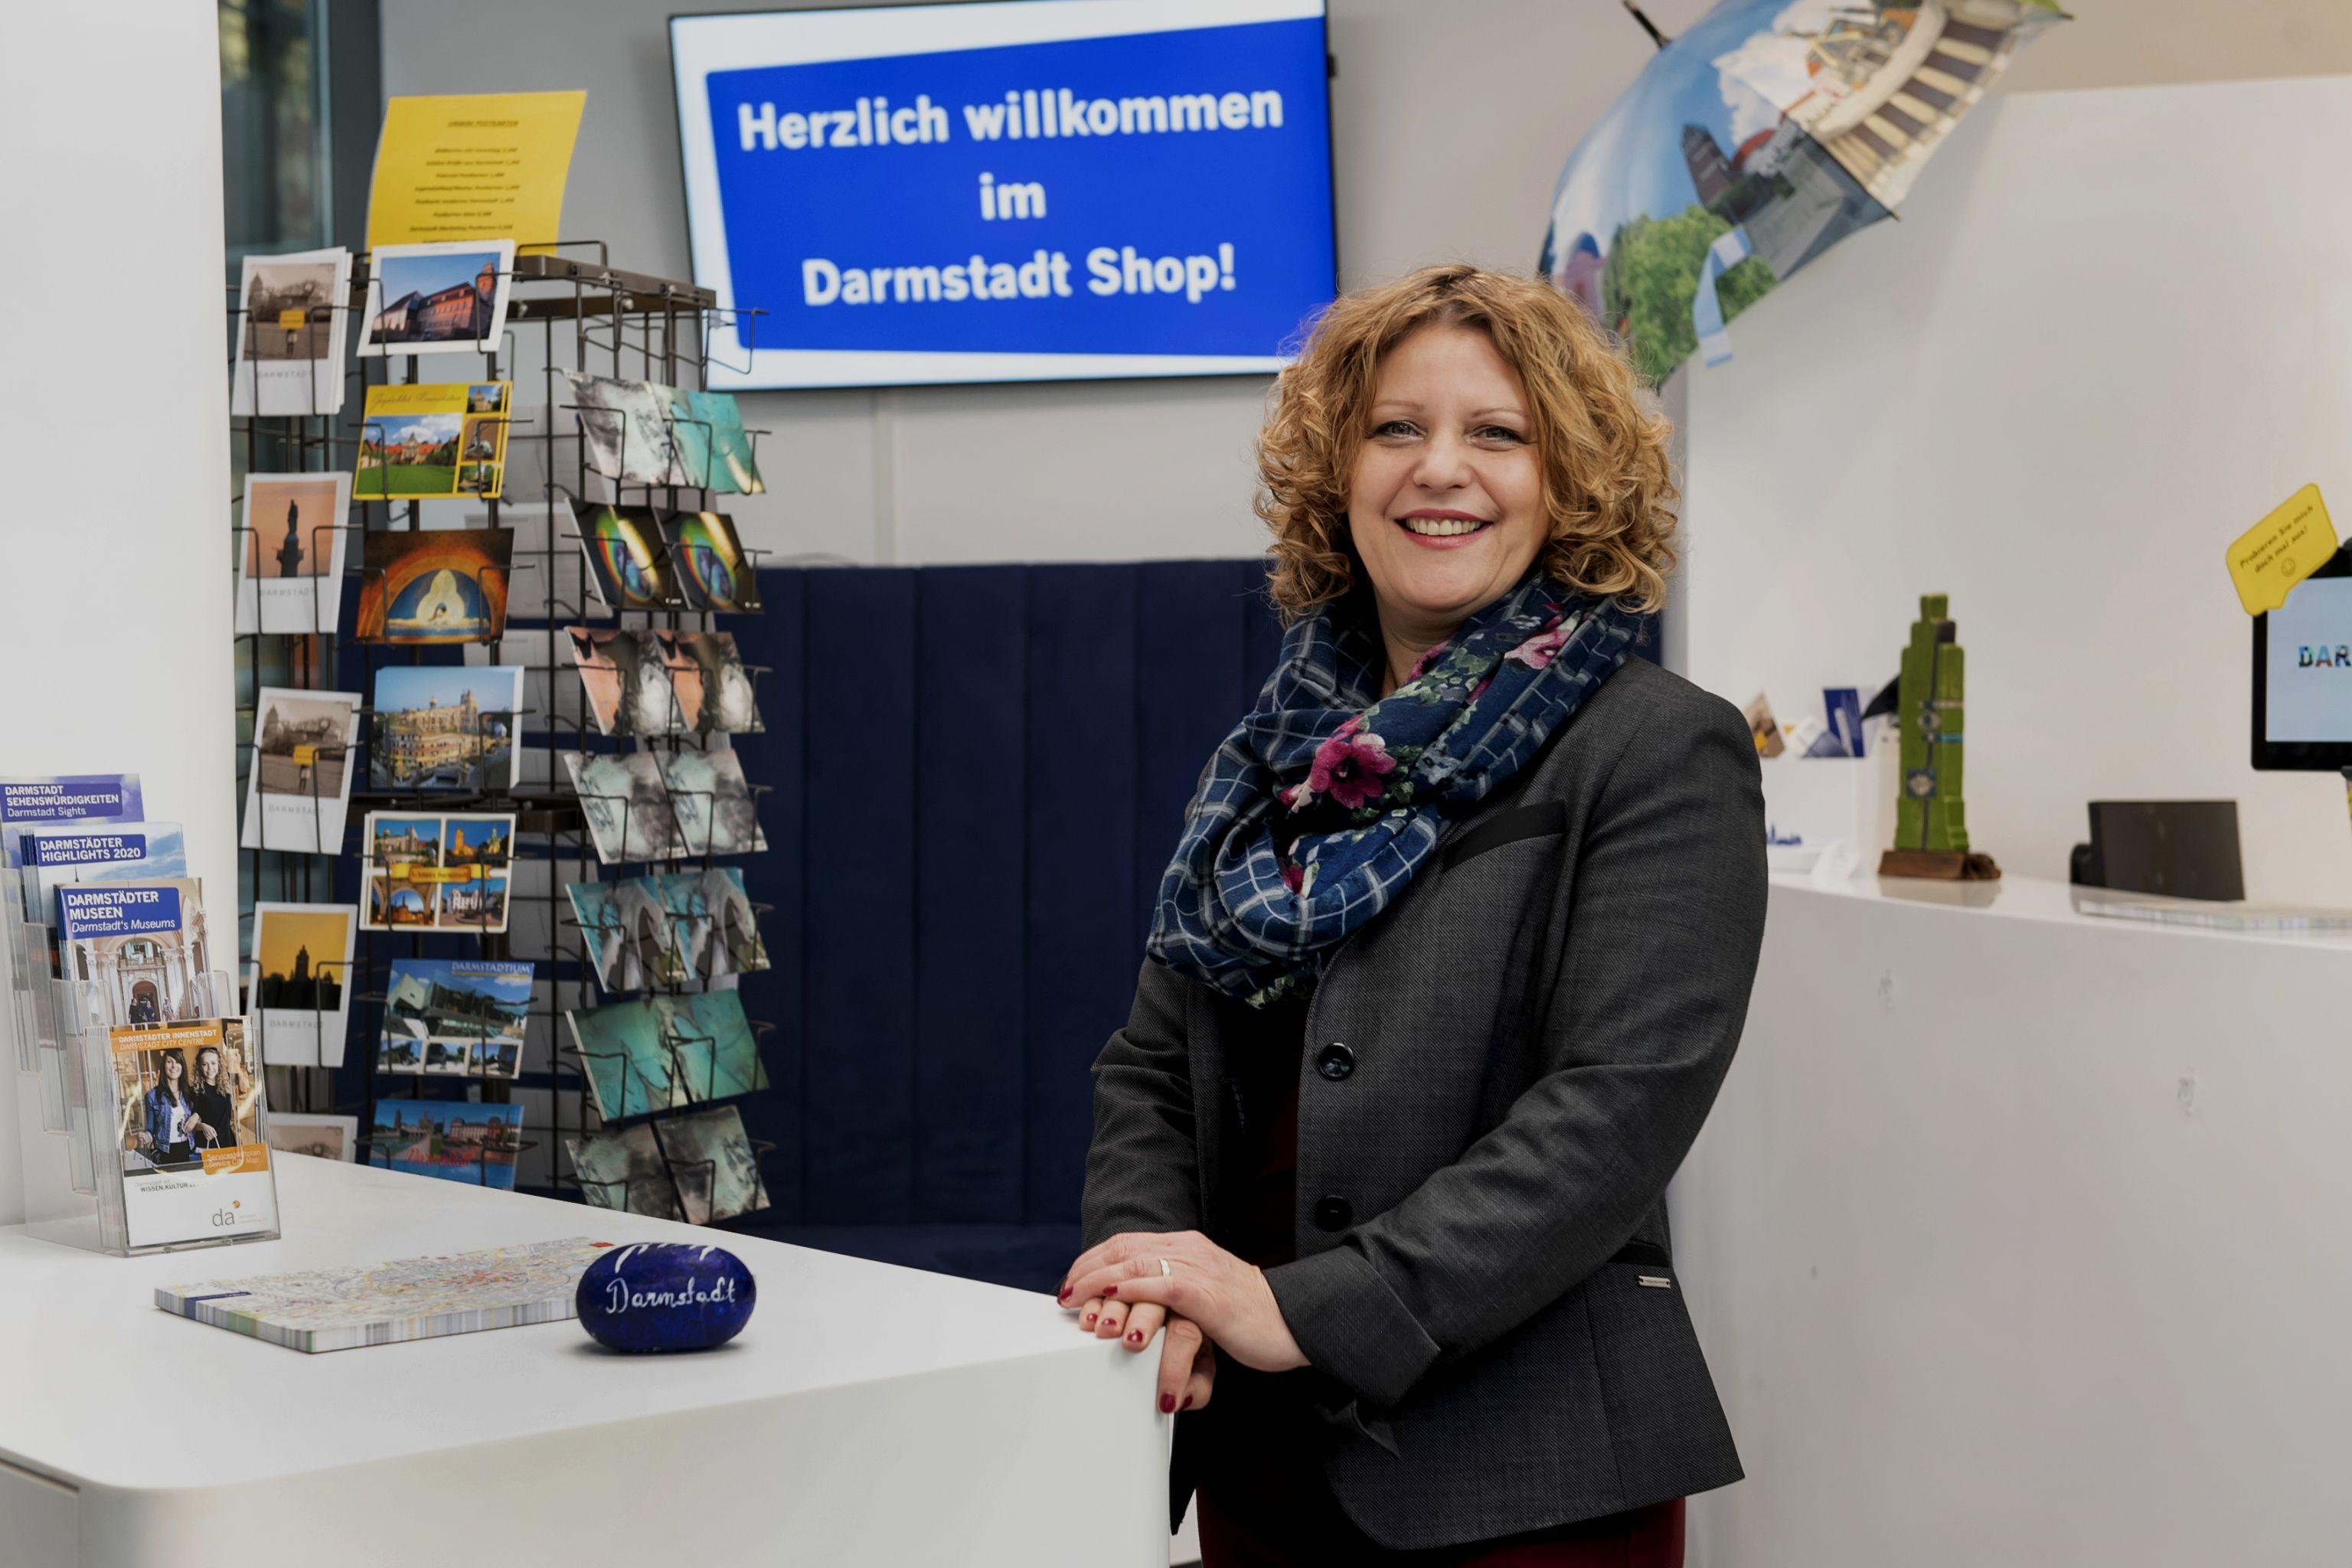 Darmstadt Shop